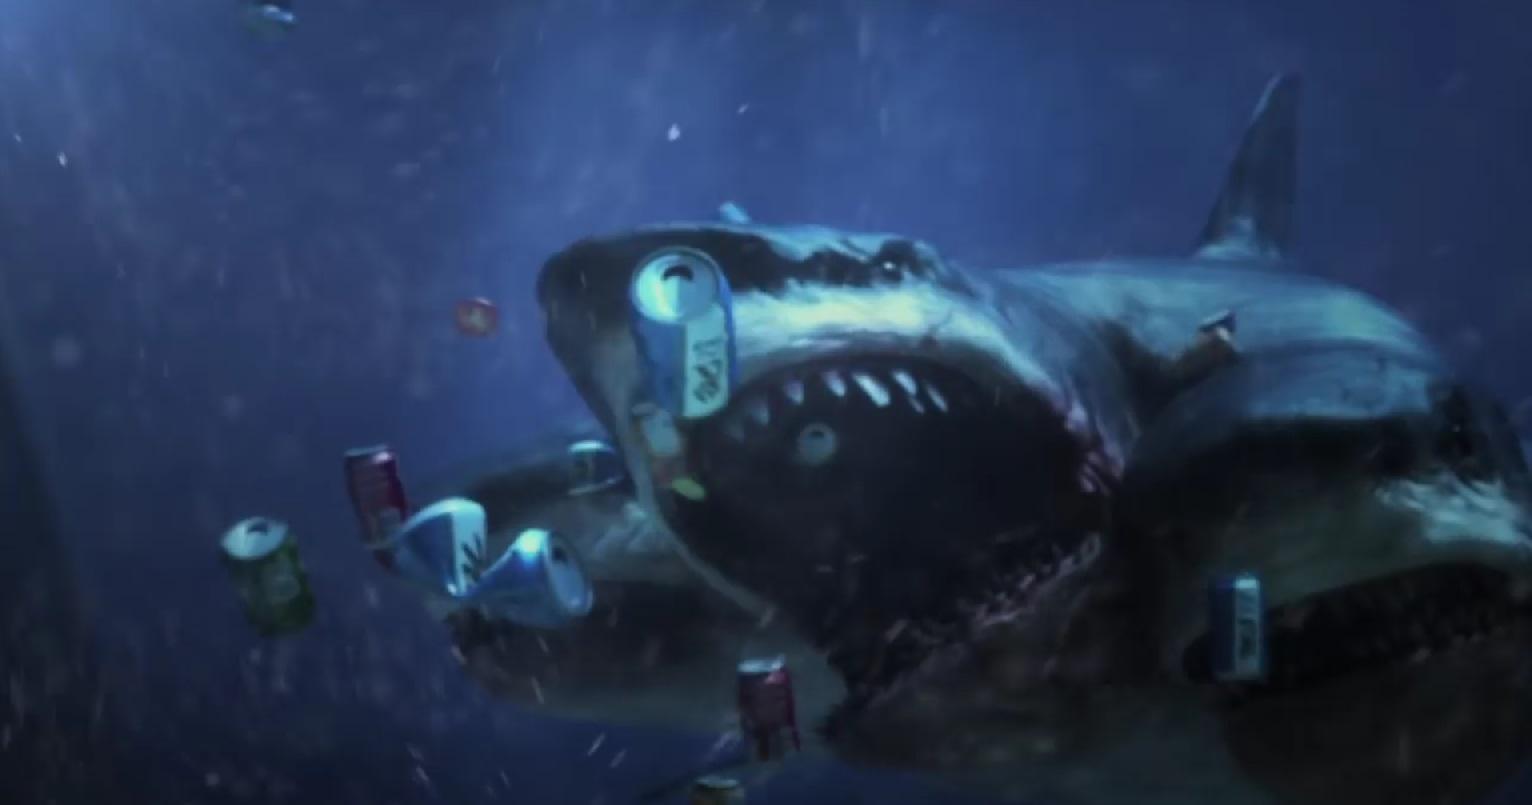 3headed shark attack dirty weekend hd